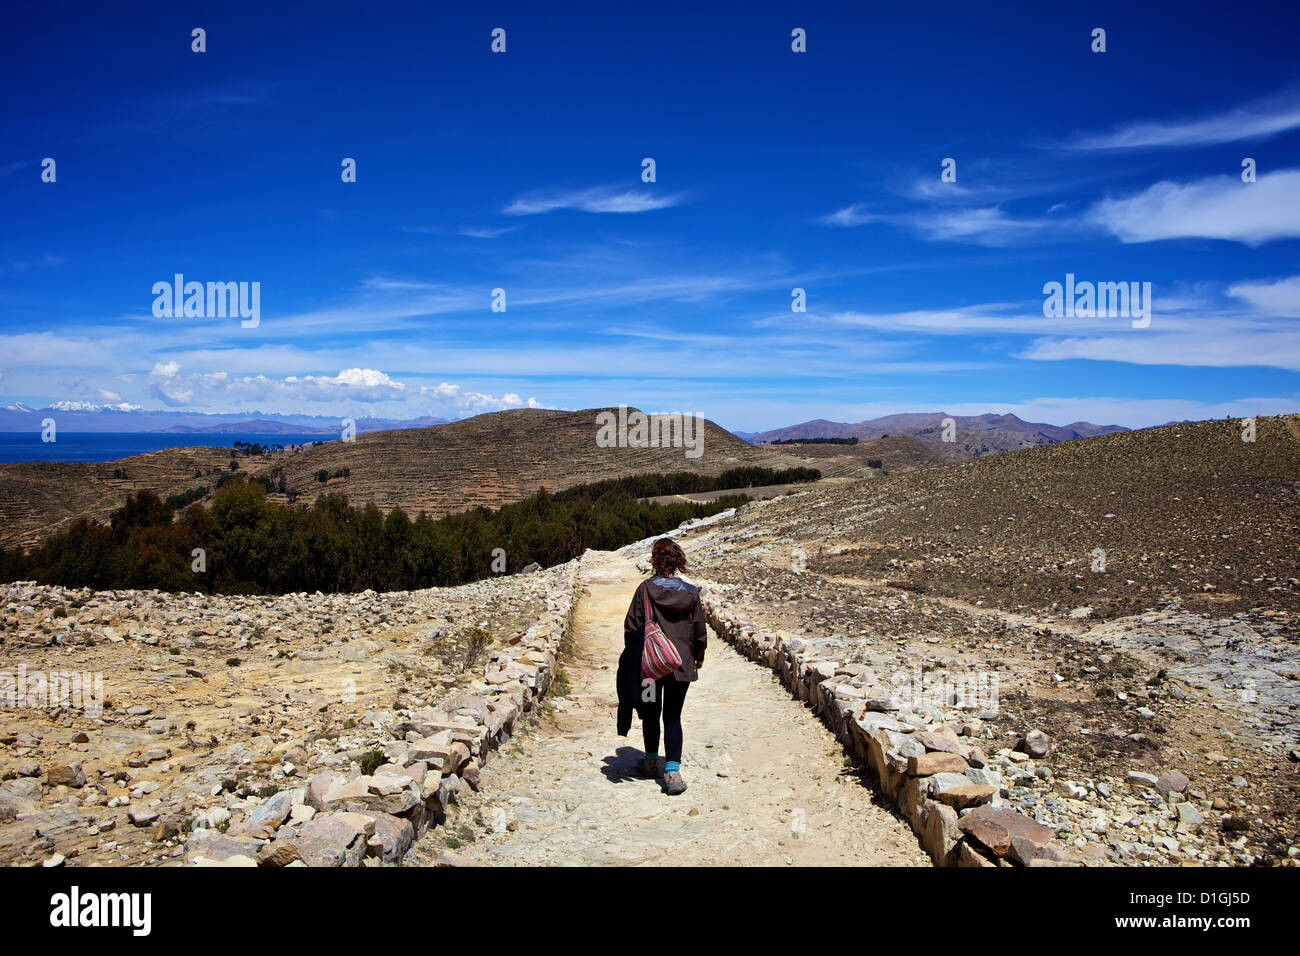 Walking down the path to the centre of the island, Isla del Sol, Lake Titicaca, Bolivia, South America - Stock Image